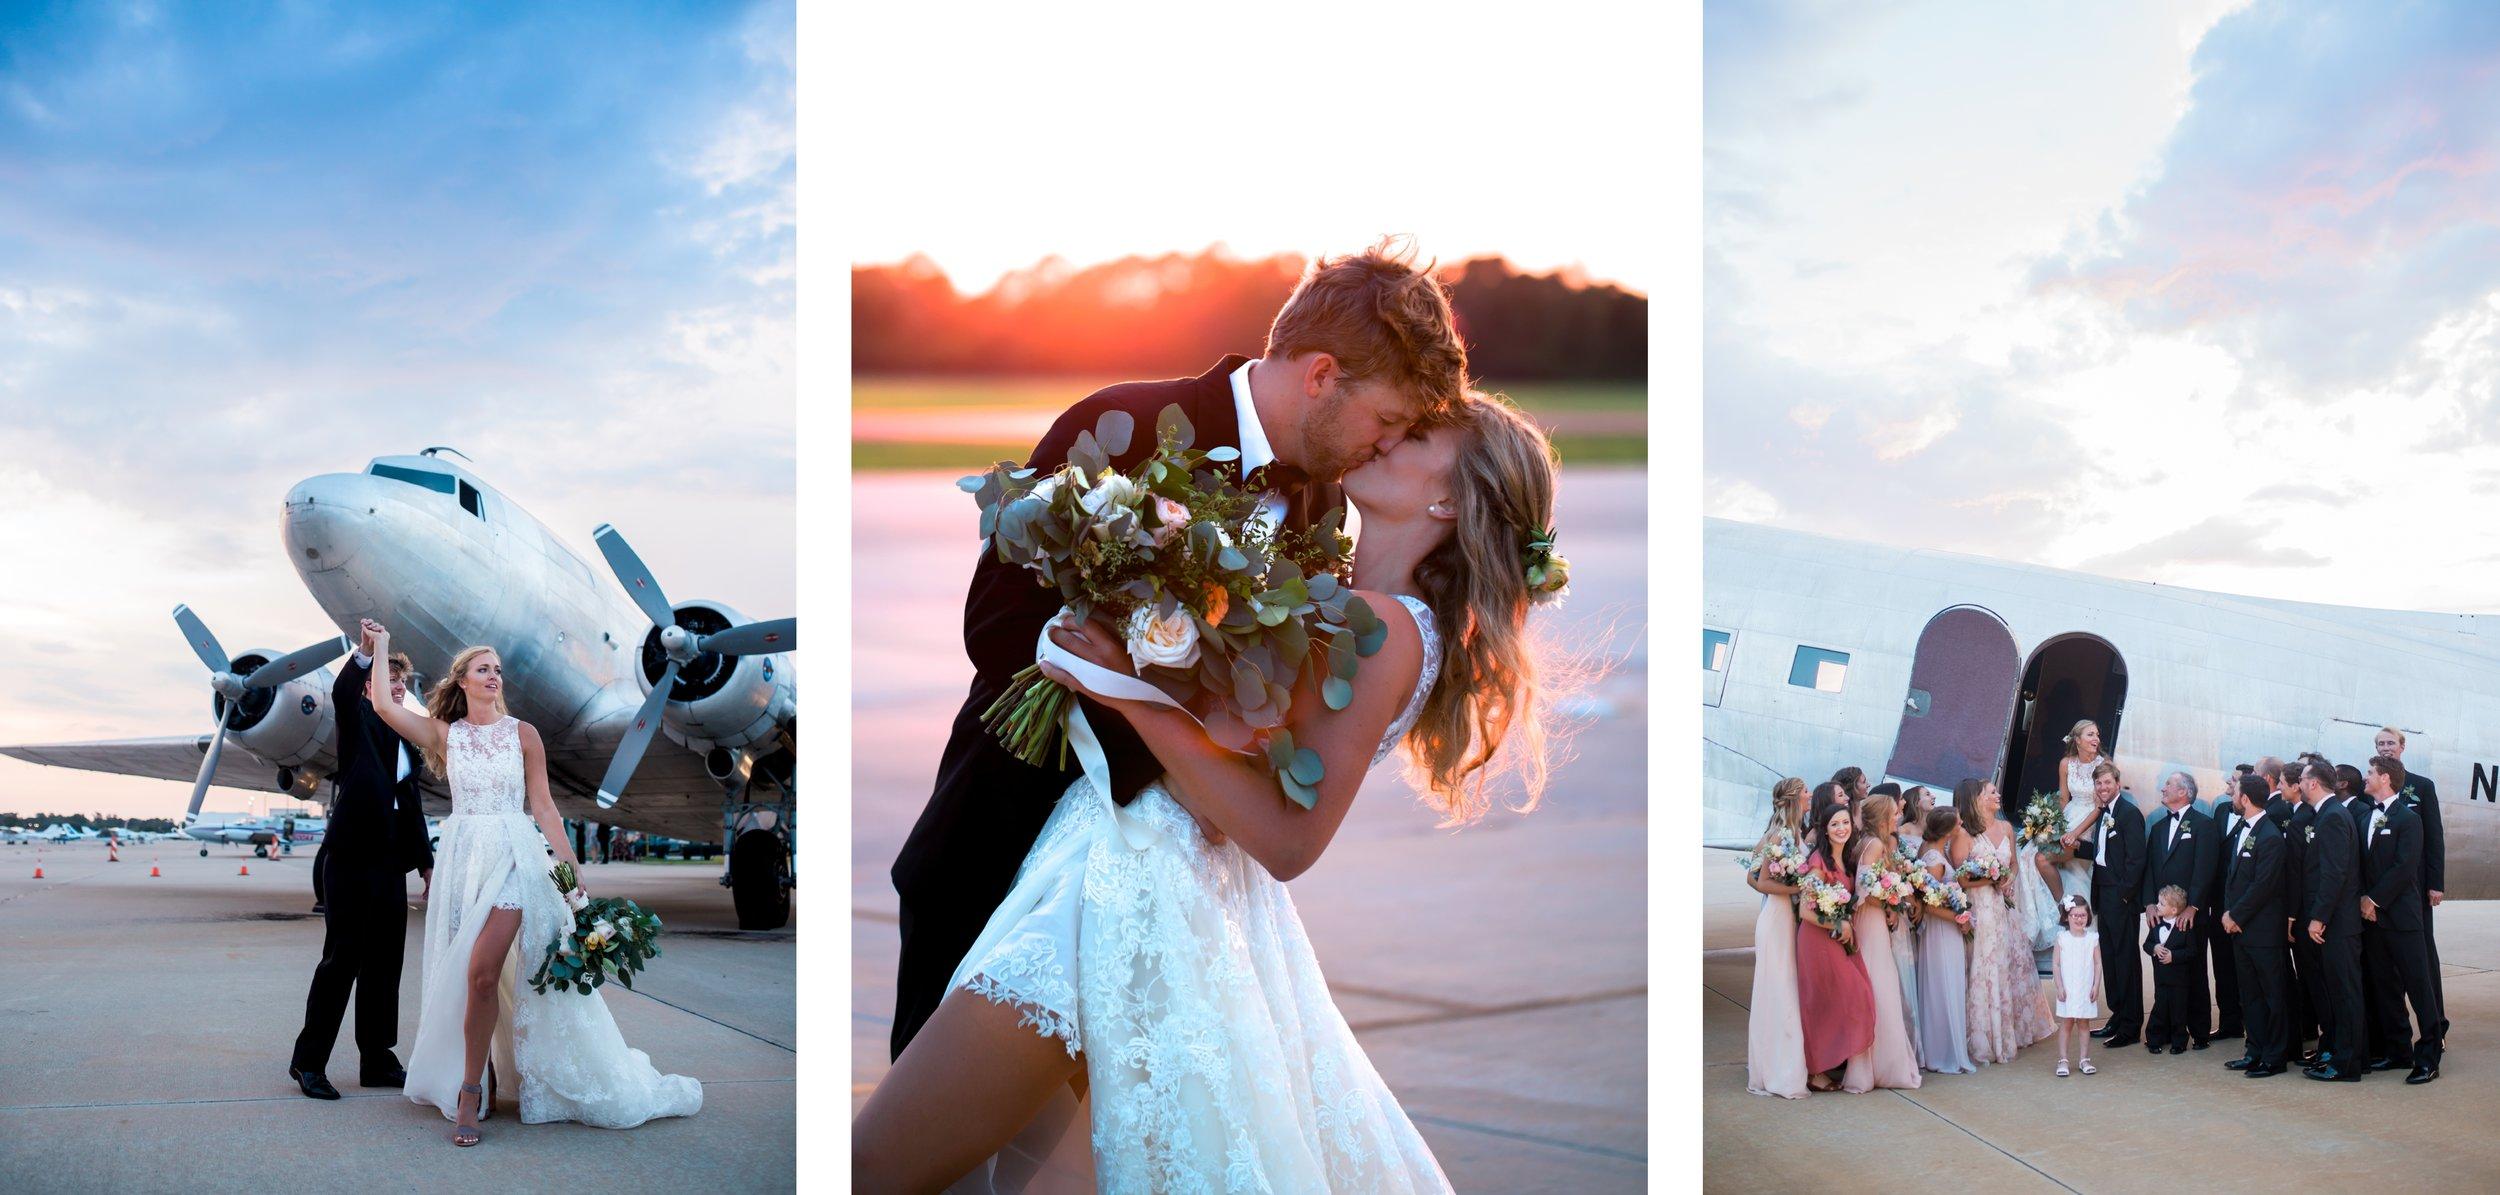 Rainey_Gregg_Photography_St._Simons_Island_Georgia_California_Wedding_Portrait_Photography_0194.jpg